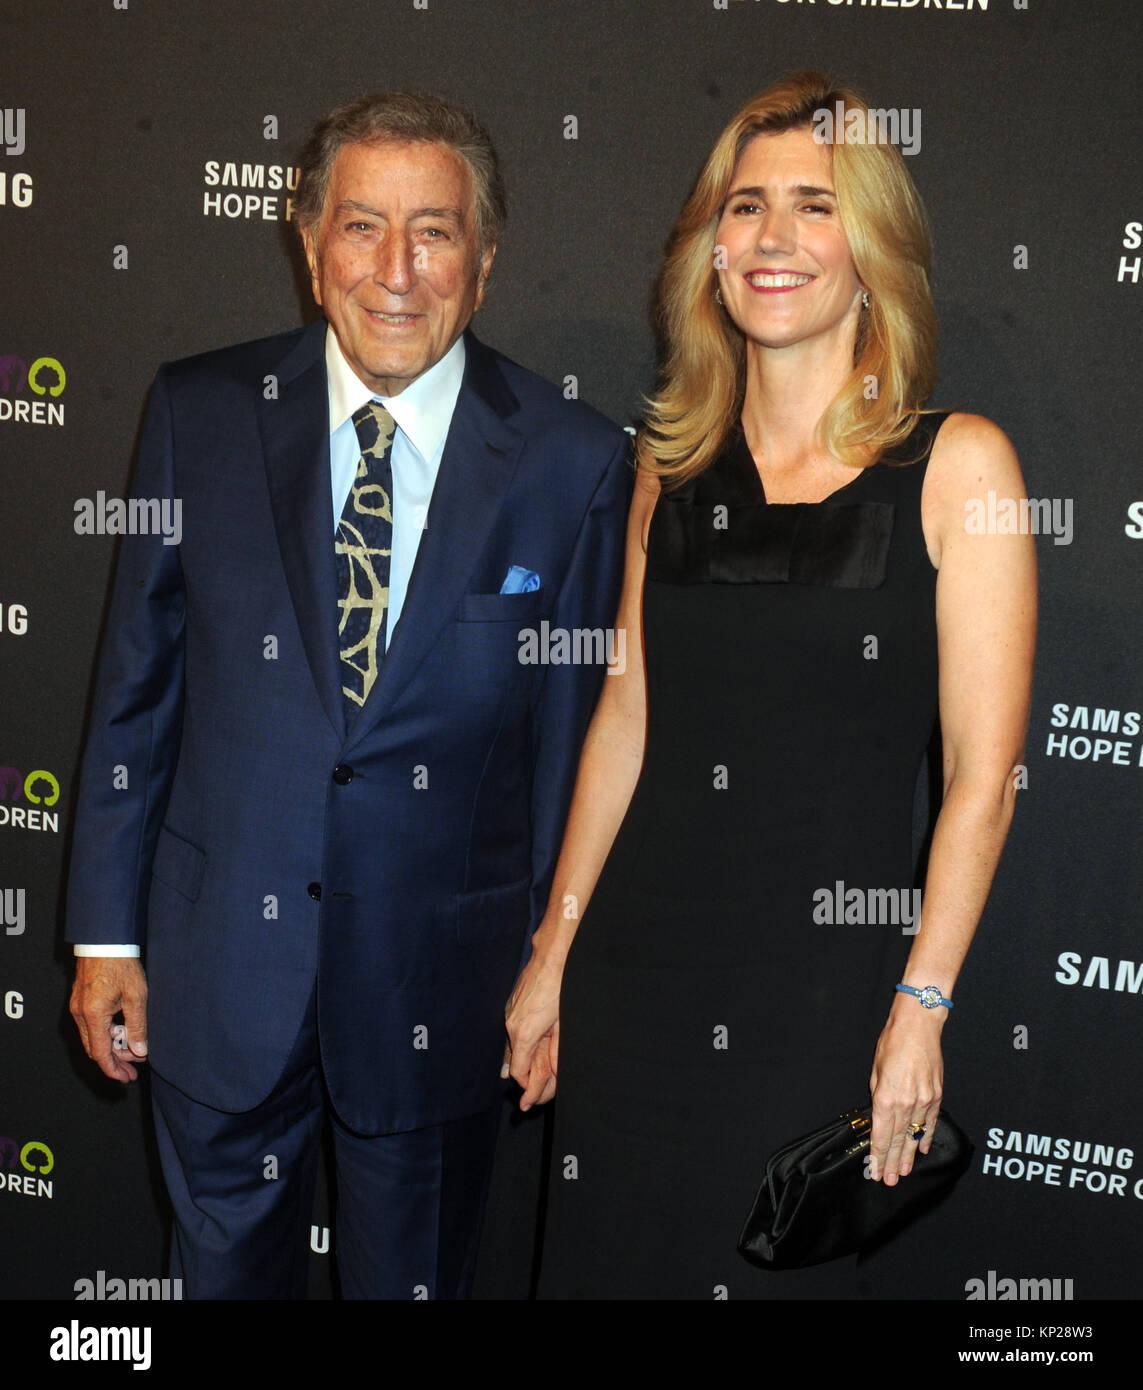 NEW YORK, NY - SEPTEMBER 17: Tony Bennett, Susan Crow attends Samsung Hope For Children Gala 2015 at Hammerstein - Stock Image